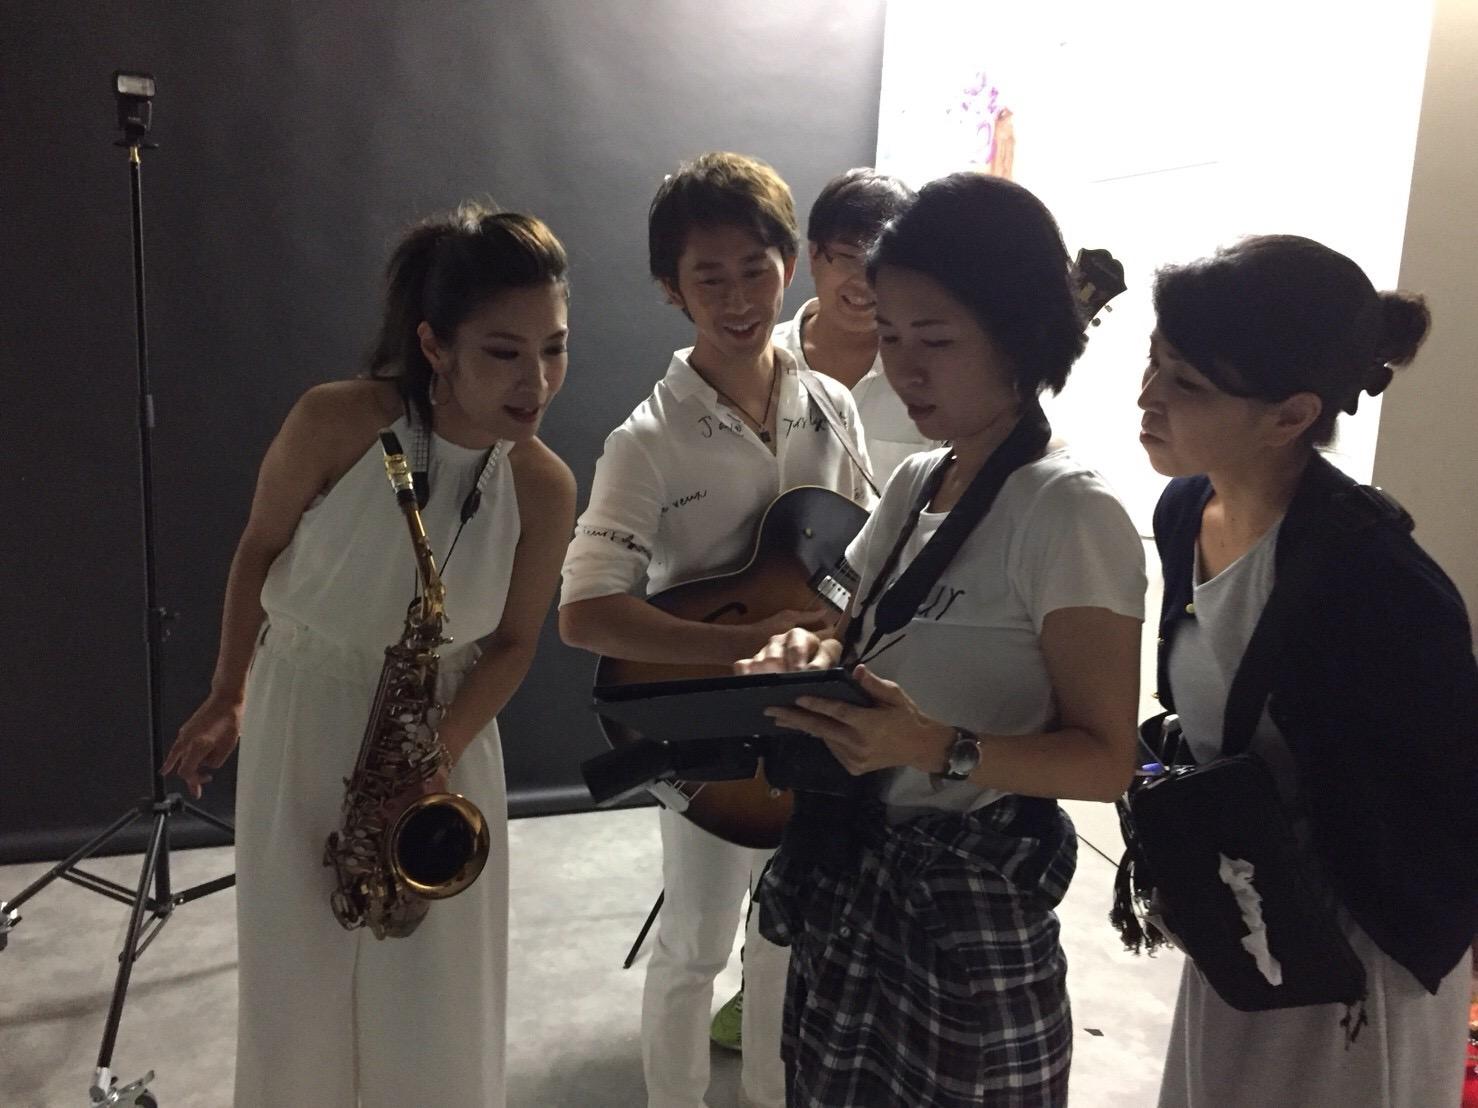 寺地美穂&皆川太一Urban Groove Session活動報告-Photoshoot編-